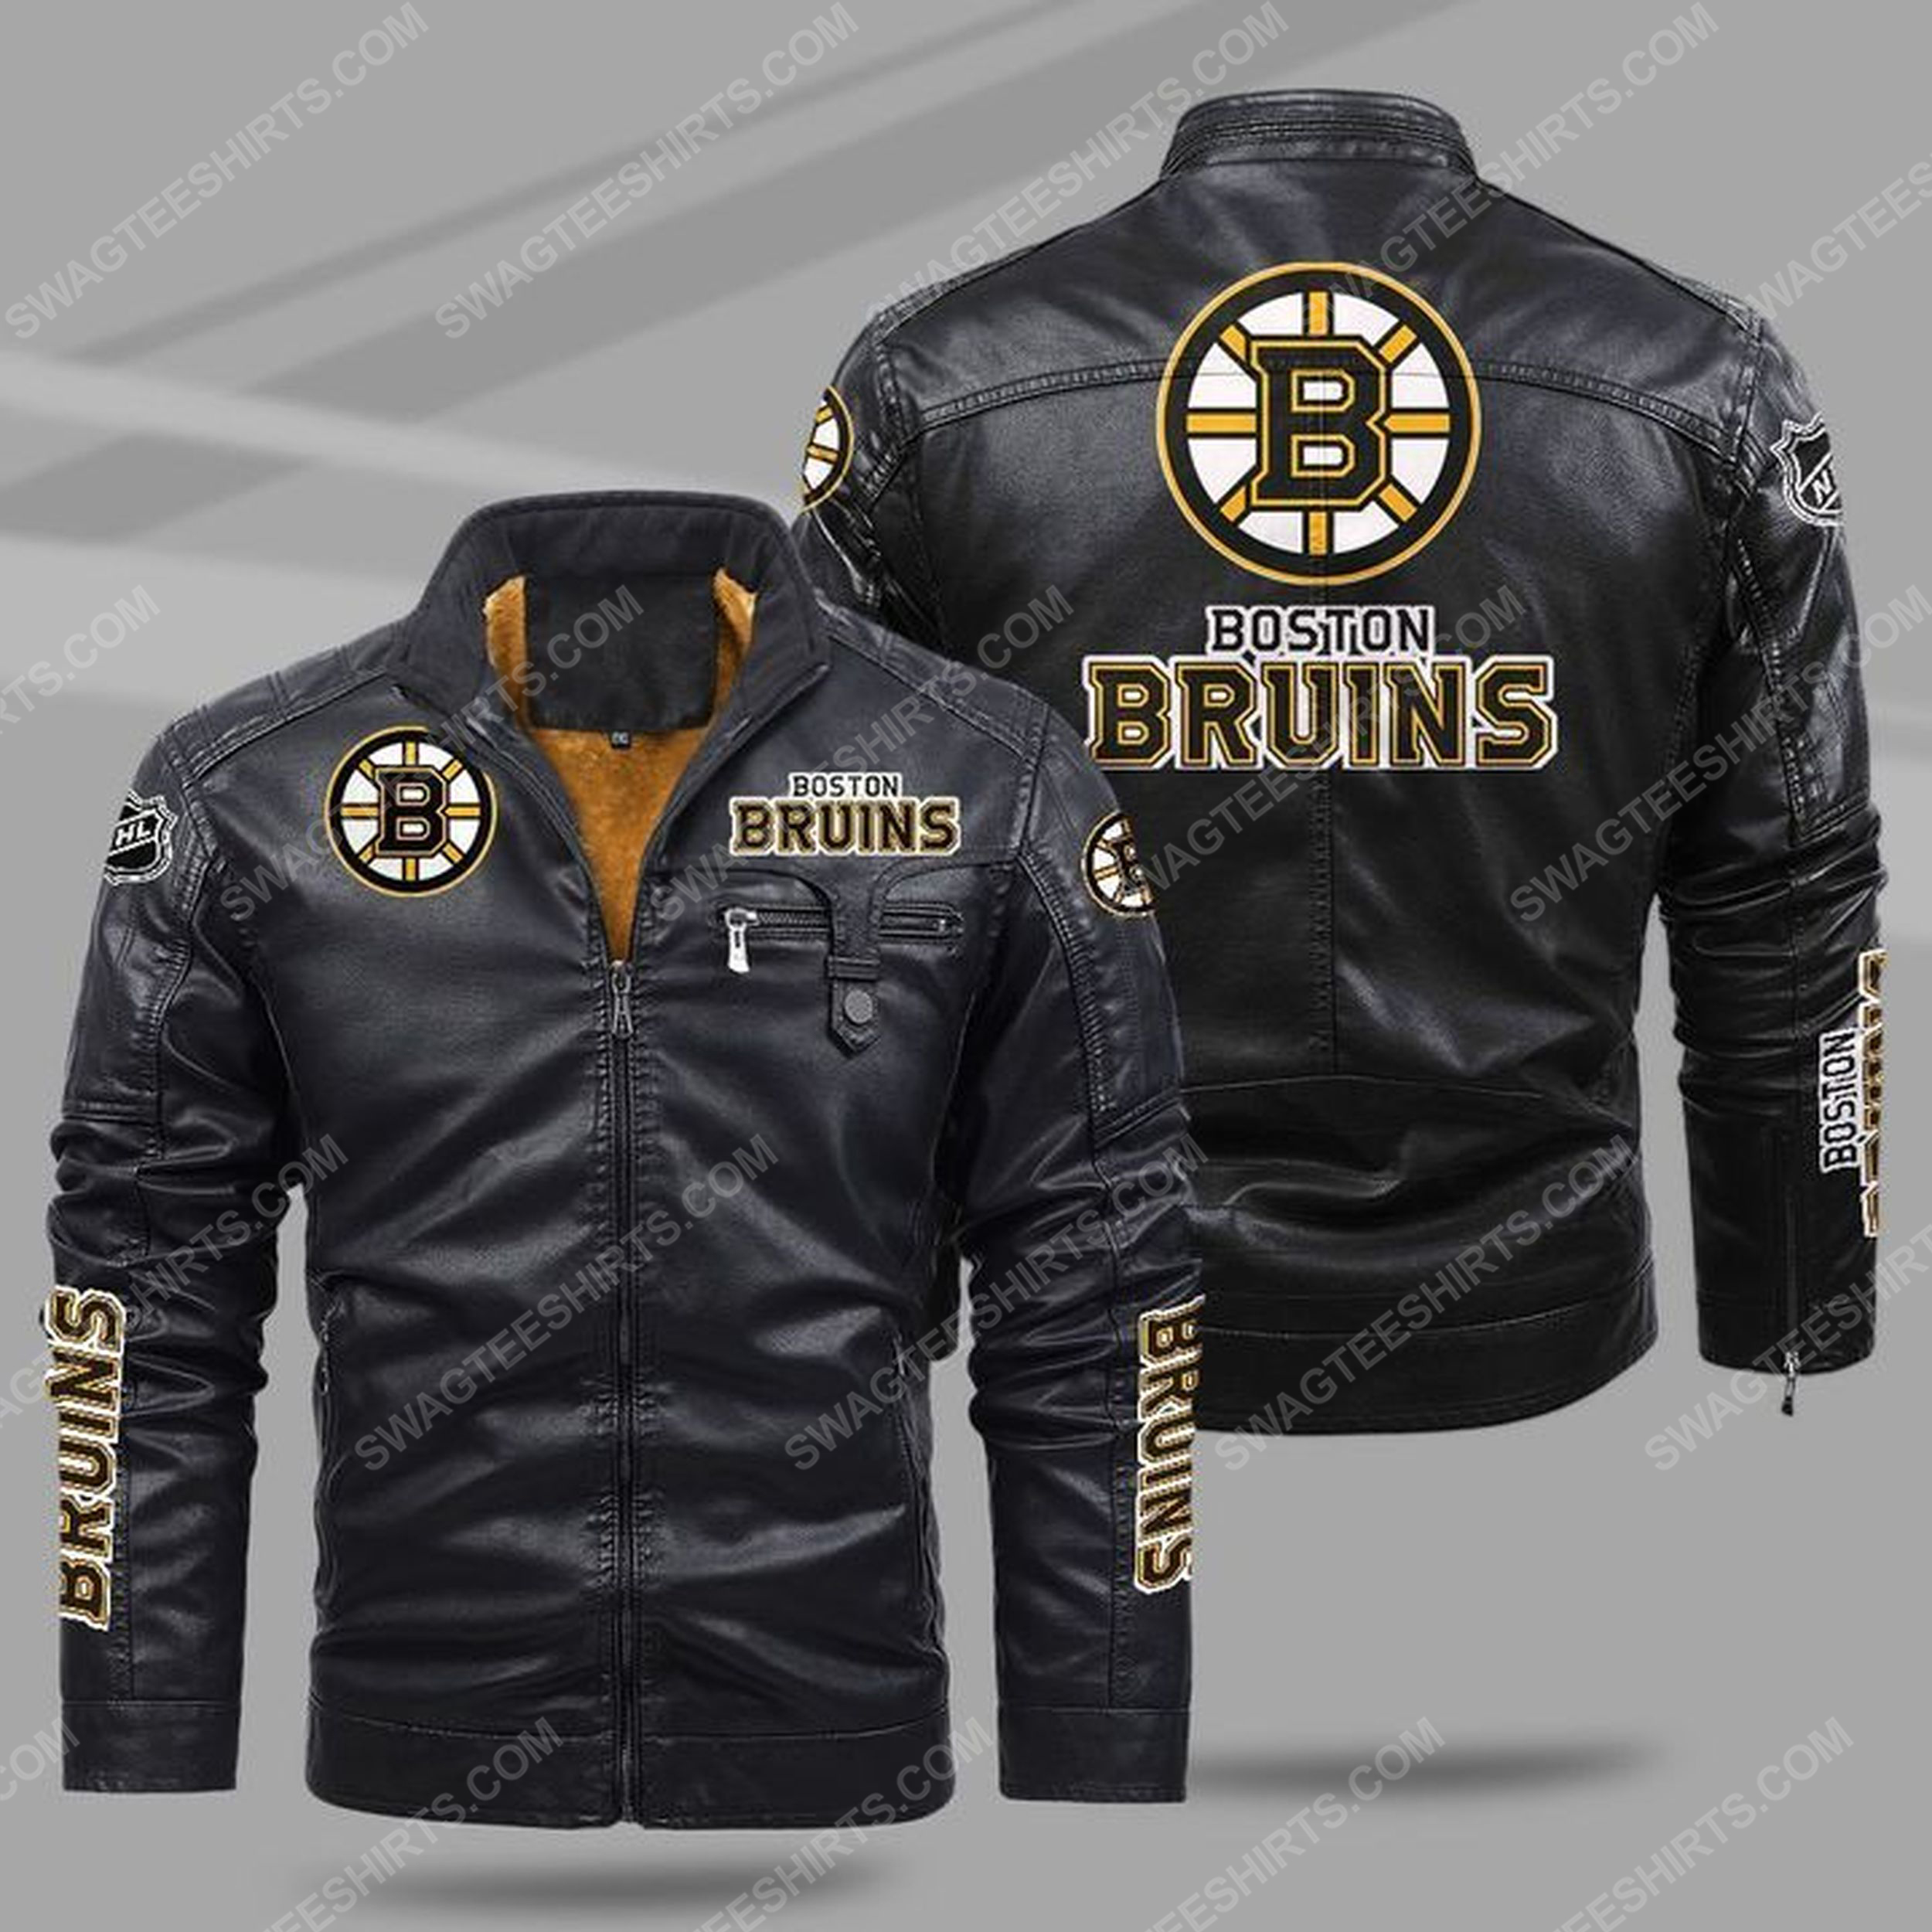 The boston bruins nhl all over print fleece leather jacket - black 1 - Copy